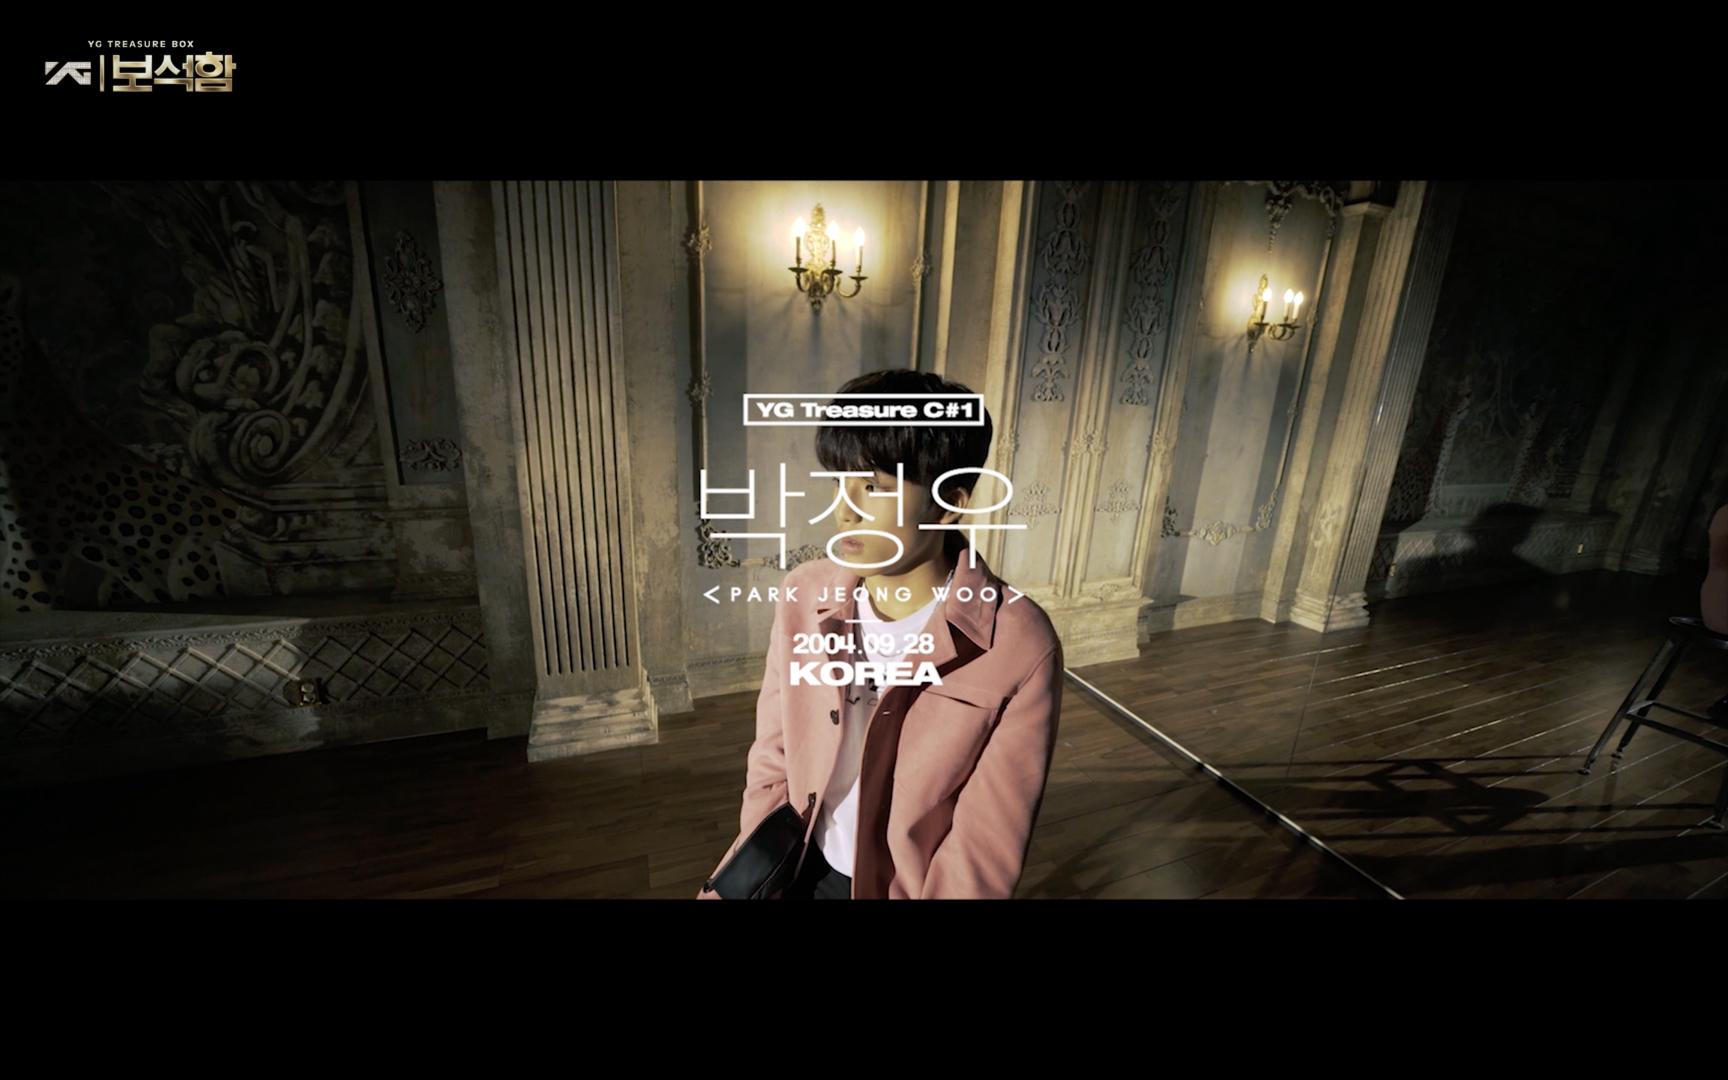 YG보석함ㅣC#1 박정우 <PARK JEONGWOO> #인터뷰+퍼포먼스